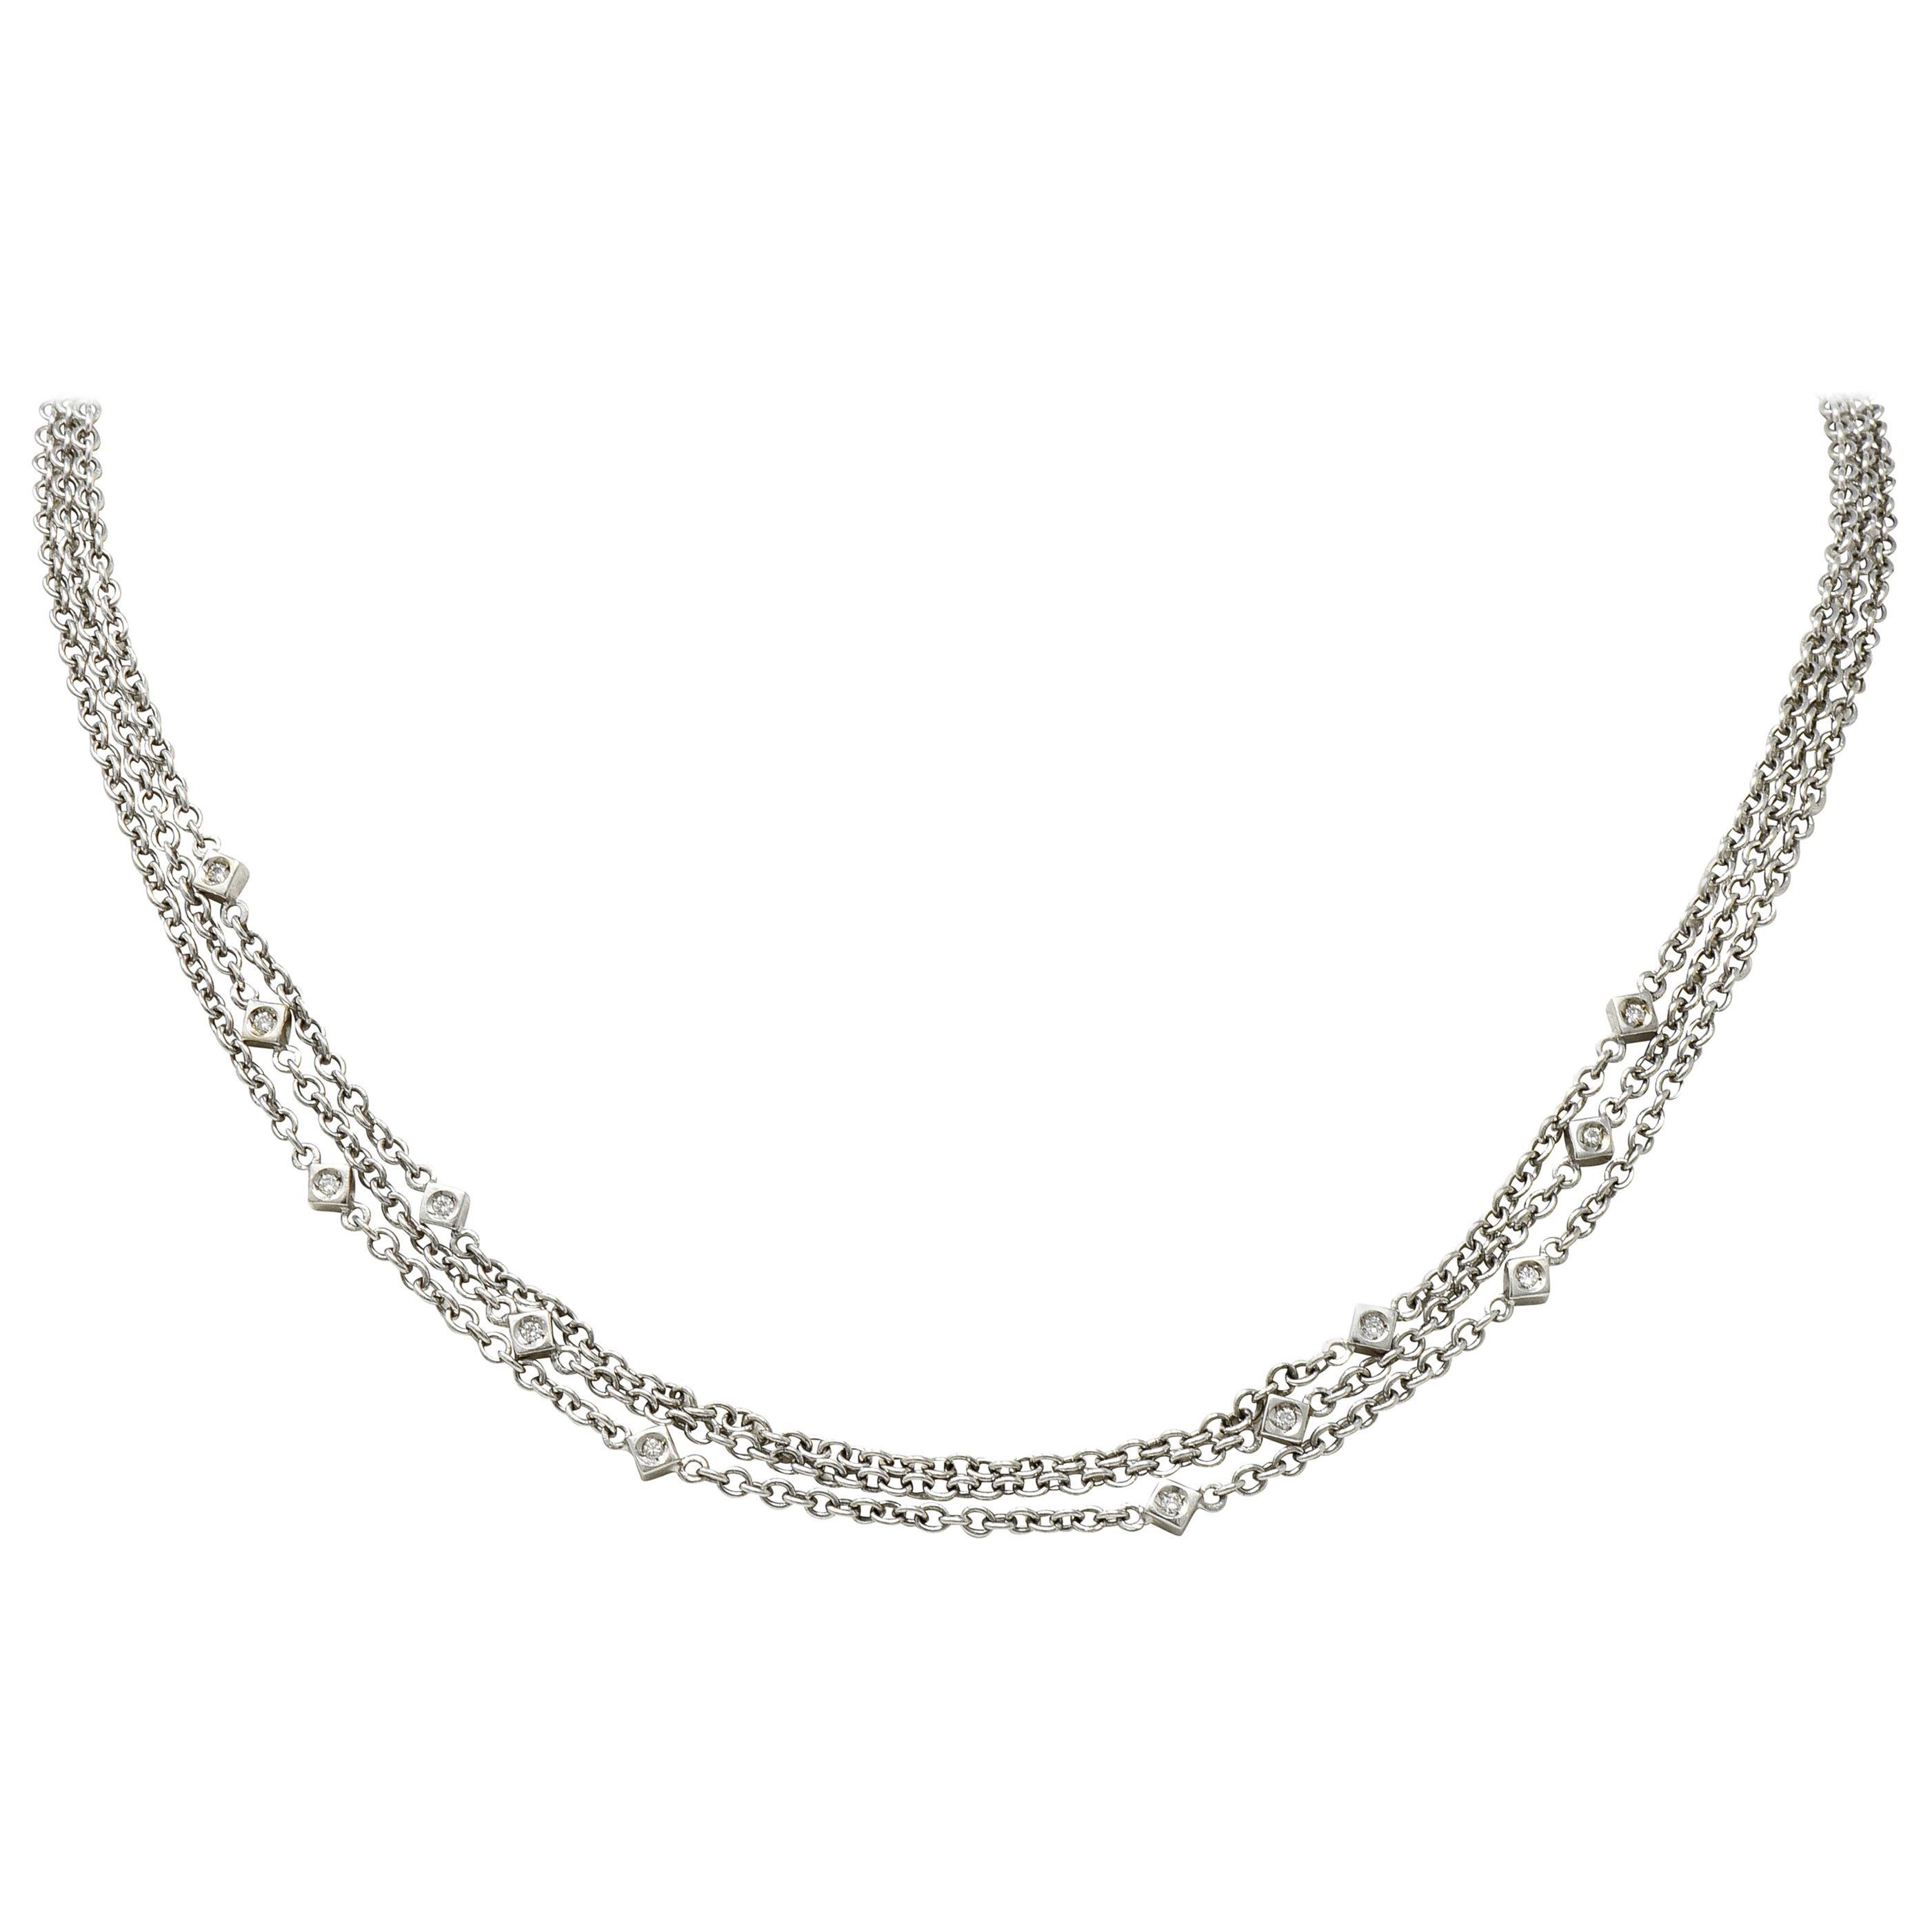 Contemporary 0.50 Carat Diamond 18 Karat White Gold Multi-Strand Necklace